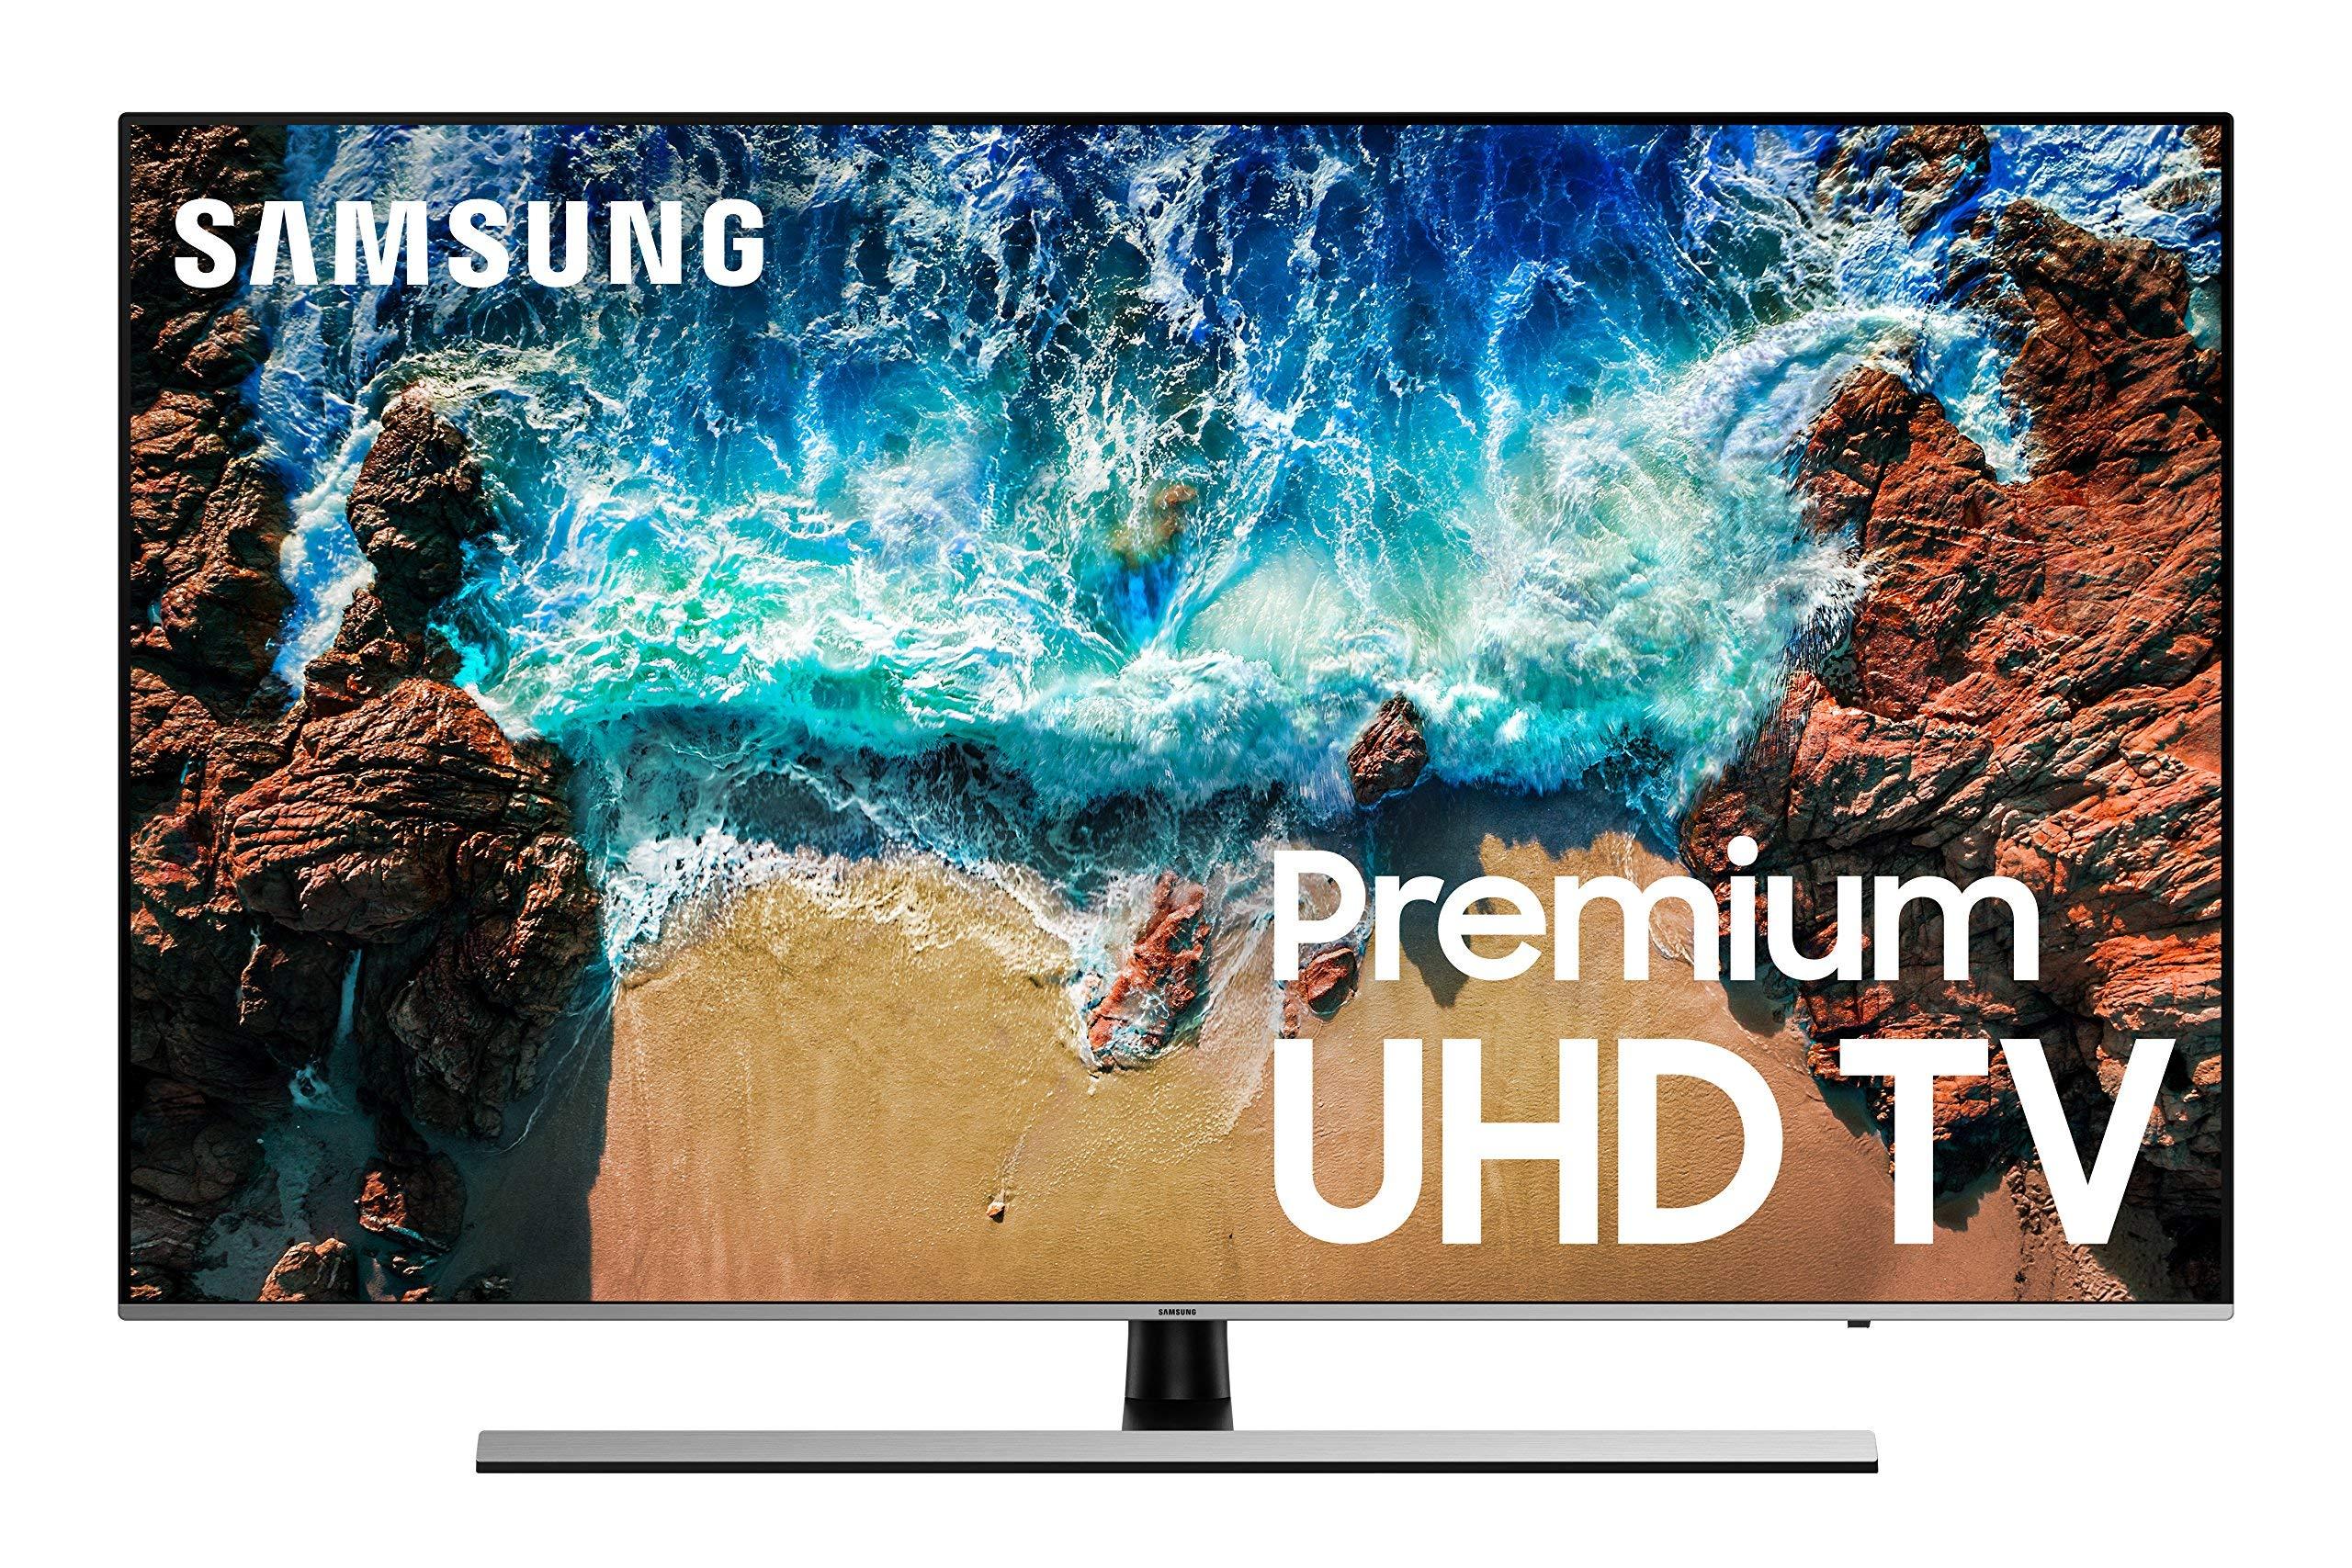 Samsung UN65NU8000 / UN65NU800D Flat 65'' 4K UHD 8 Series Smart LED TV (Renewed)